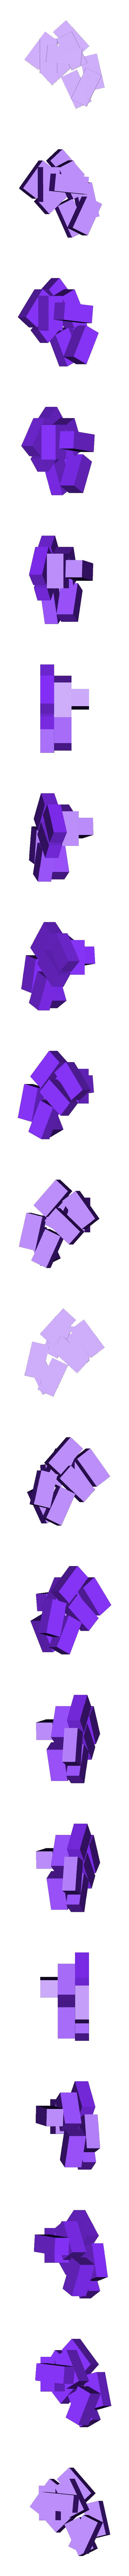 IsOrphansBoss_Bricks.stl Download free STL file Is Orphans, Boss. • 3D print model, asininedave